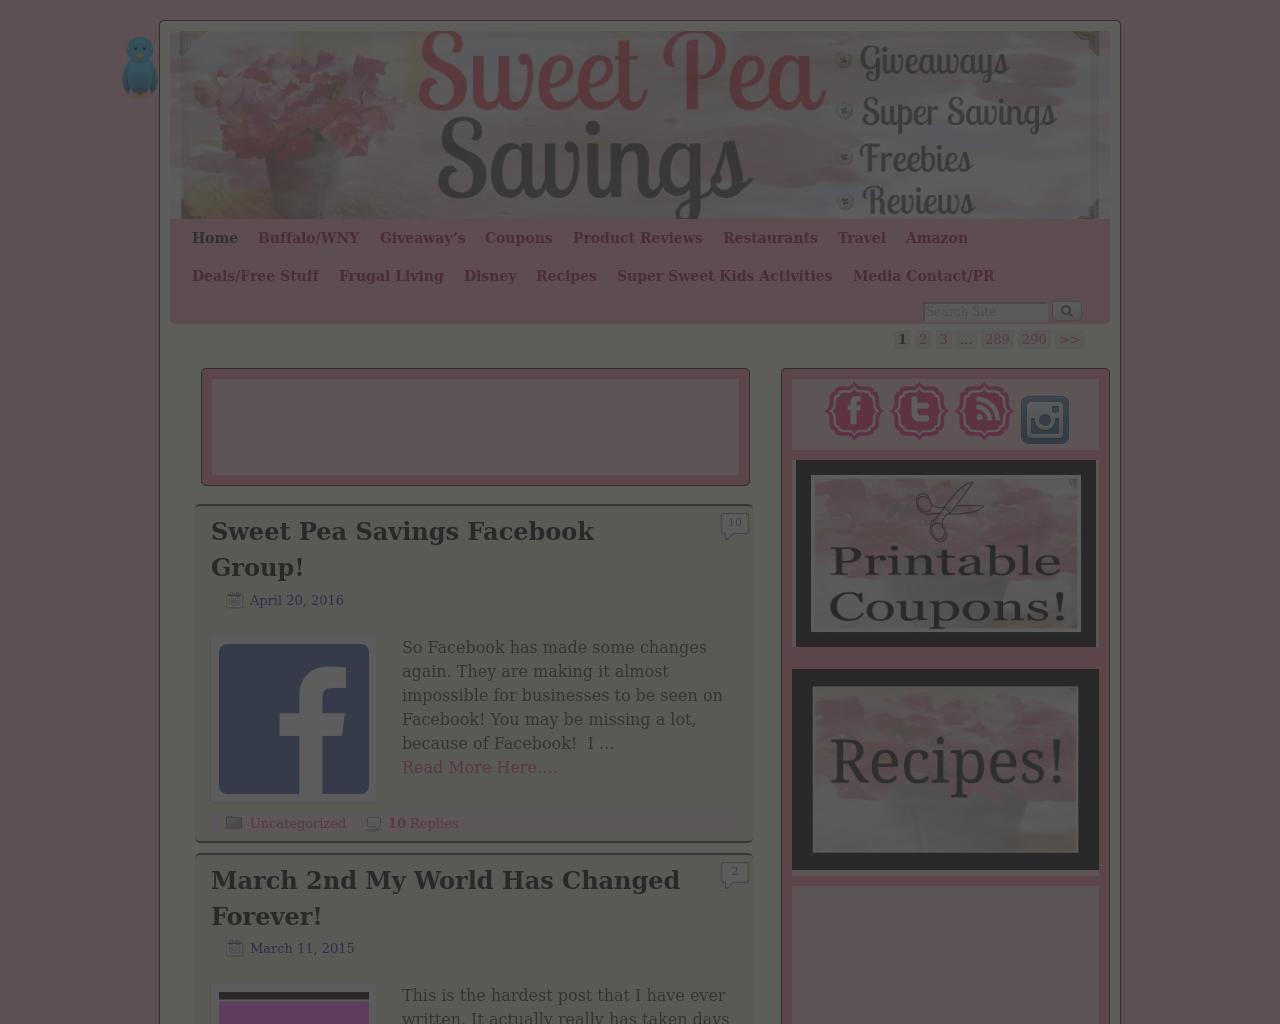 Sweet-Pea-Savings-Advertising-Reviews-Pricing